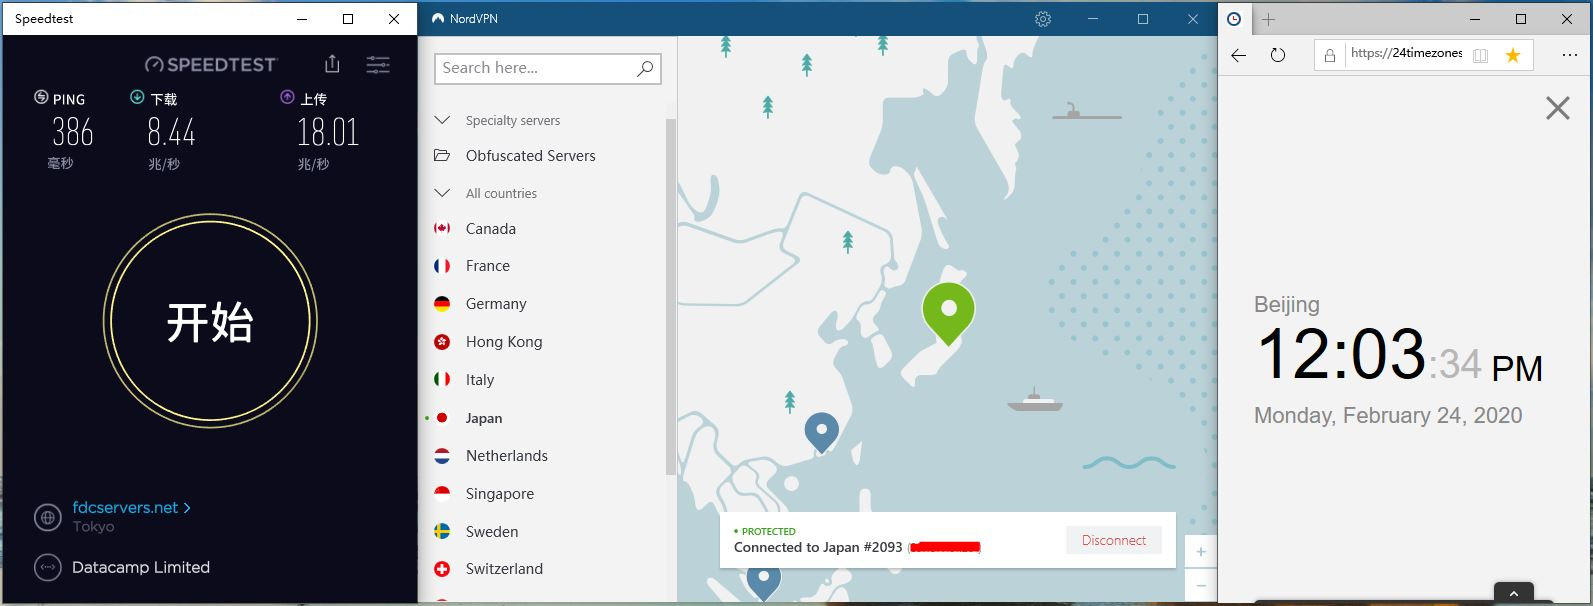 Windows10 NordsVPN Japan - 2093 中国VPN翻墙 科学上网 SpeedTest测试 - 20200224